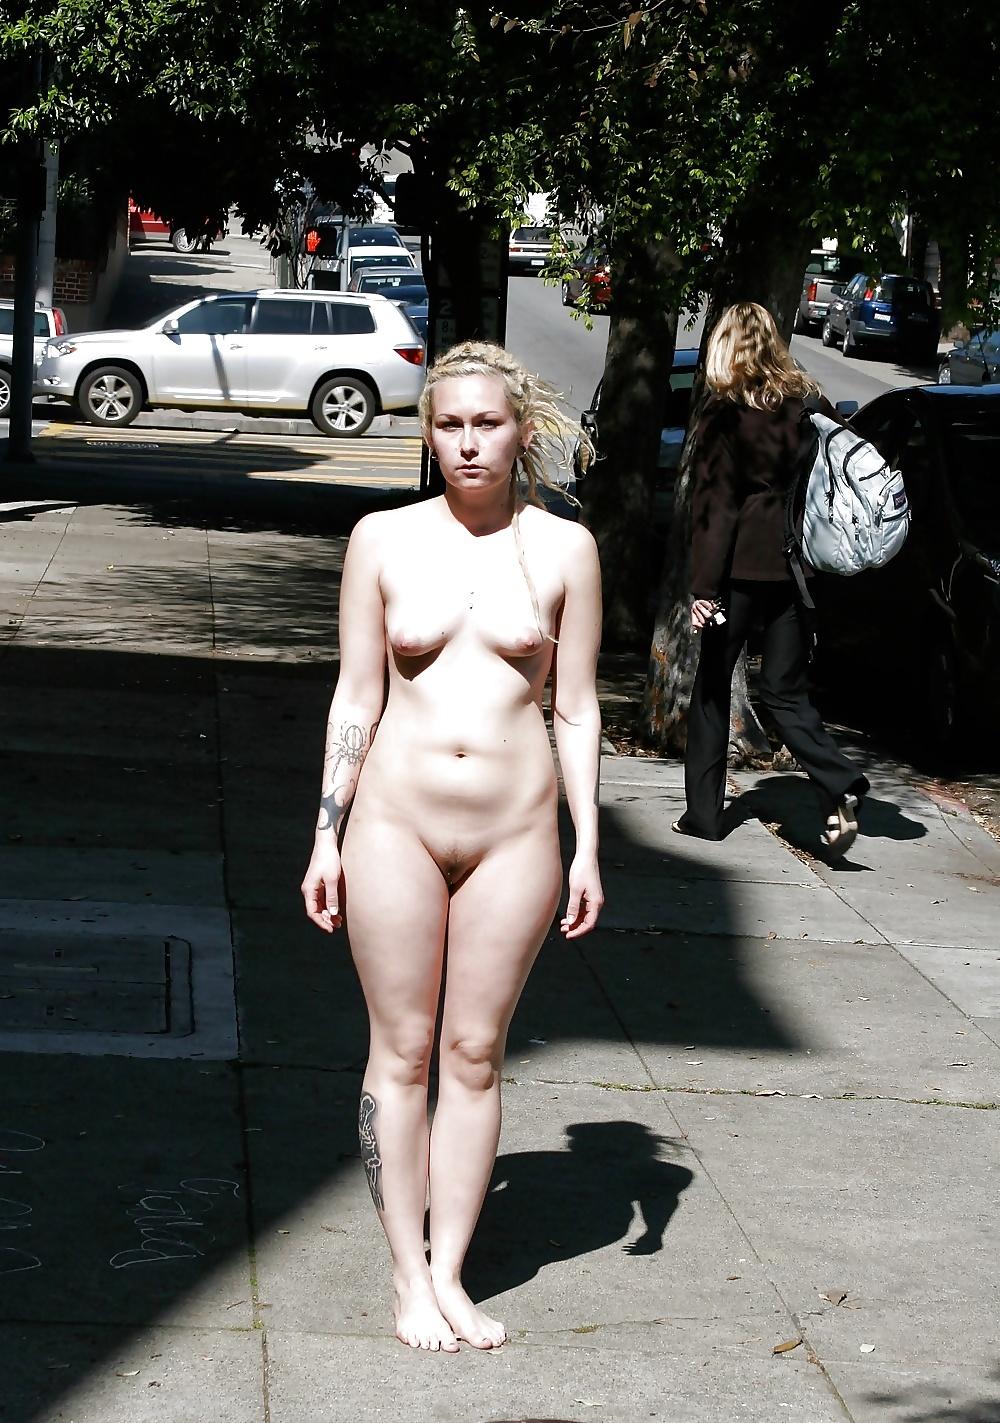 Full female frontal nudity celebrities